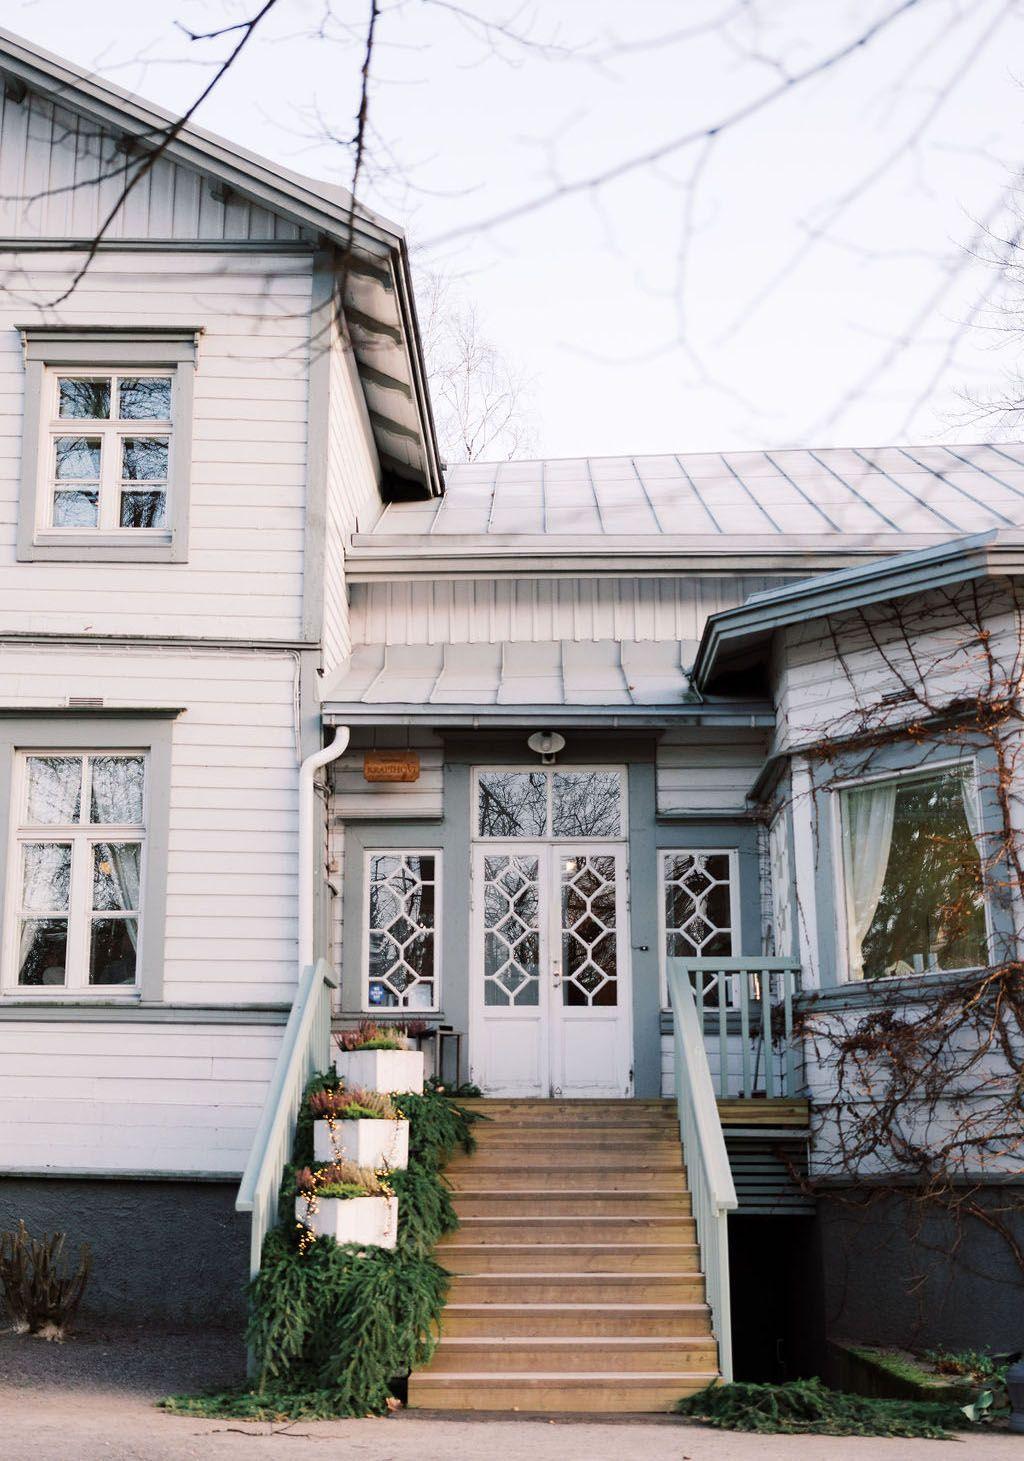 Puuhuvila Krapihovi on oiva hää- ja juhlapaikka Tuusulassa pääkaupunkiseudulla